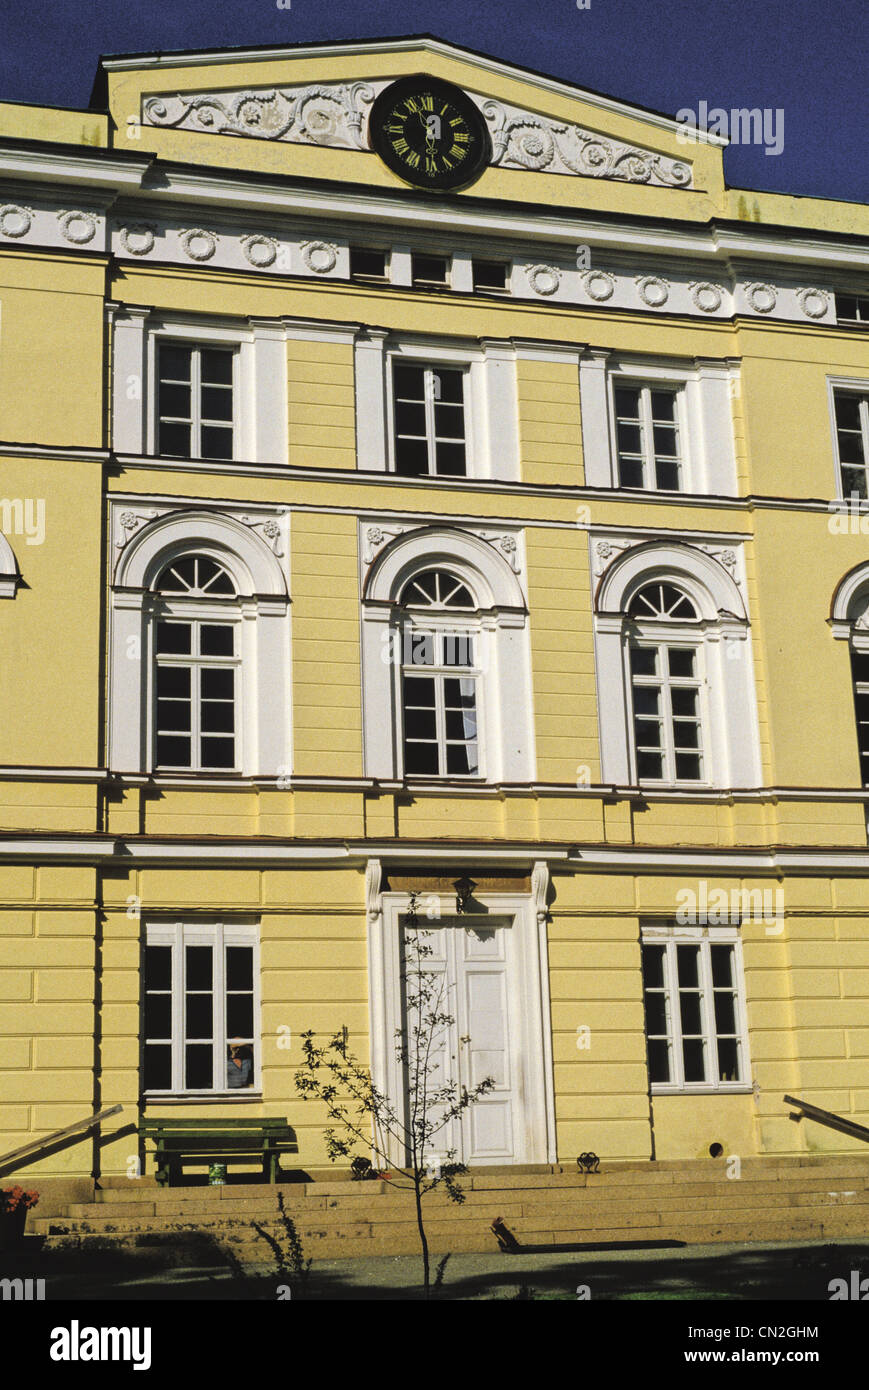 1836-Empire-Stil Vuojoki Manor wurde von Carl Ludvig Engel in Eurajoki, Finnland. Stockbild